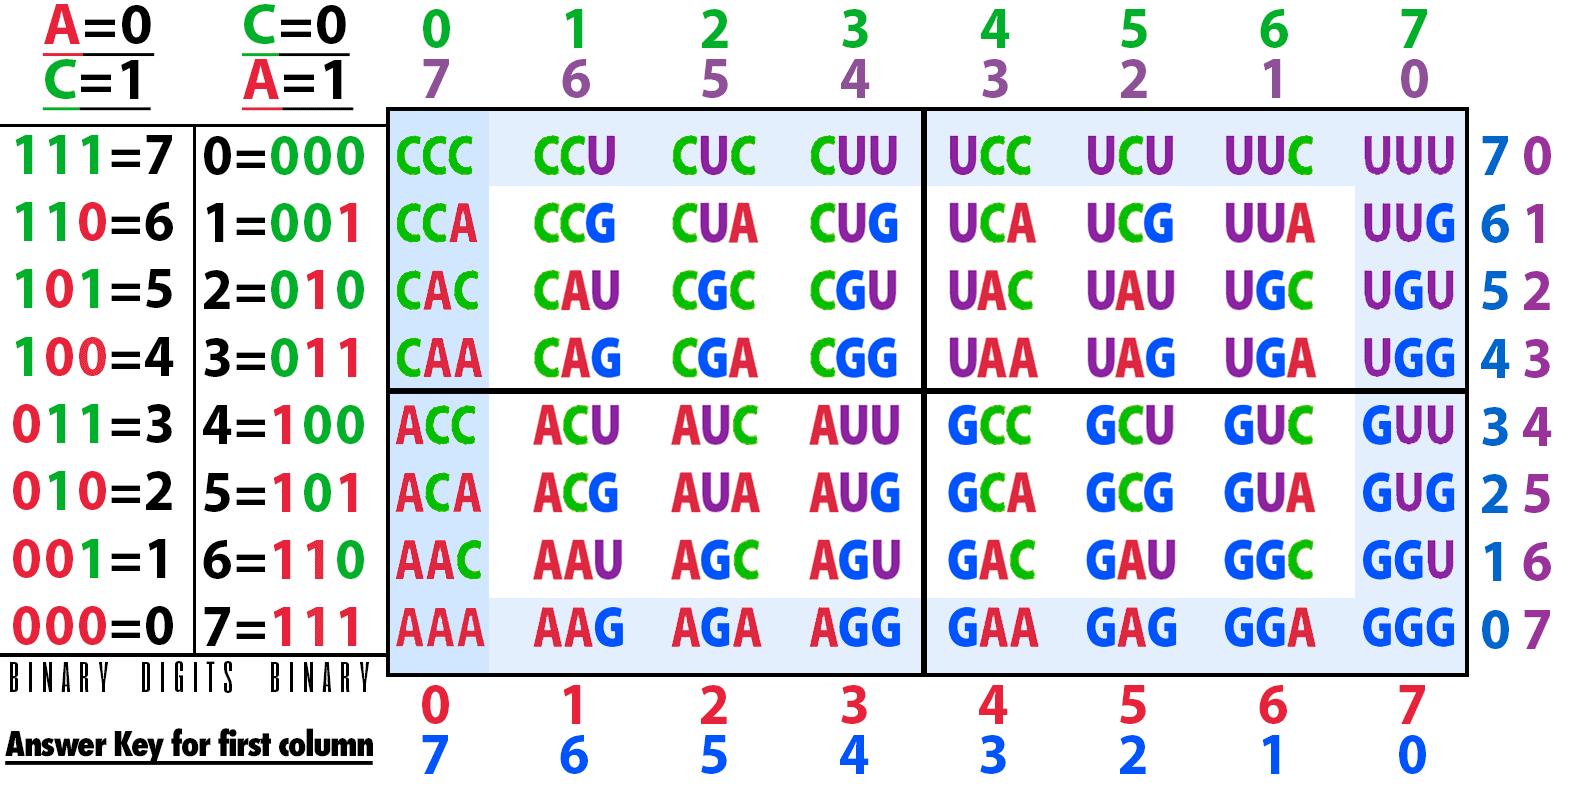 9-RNA-puzzle